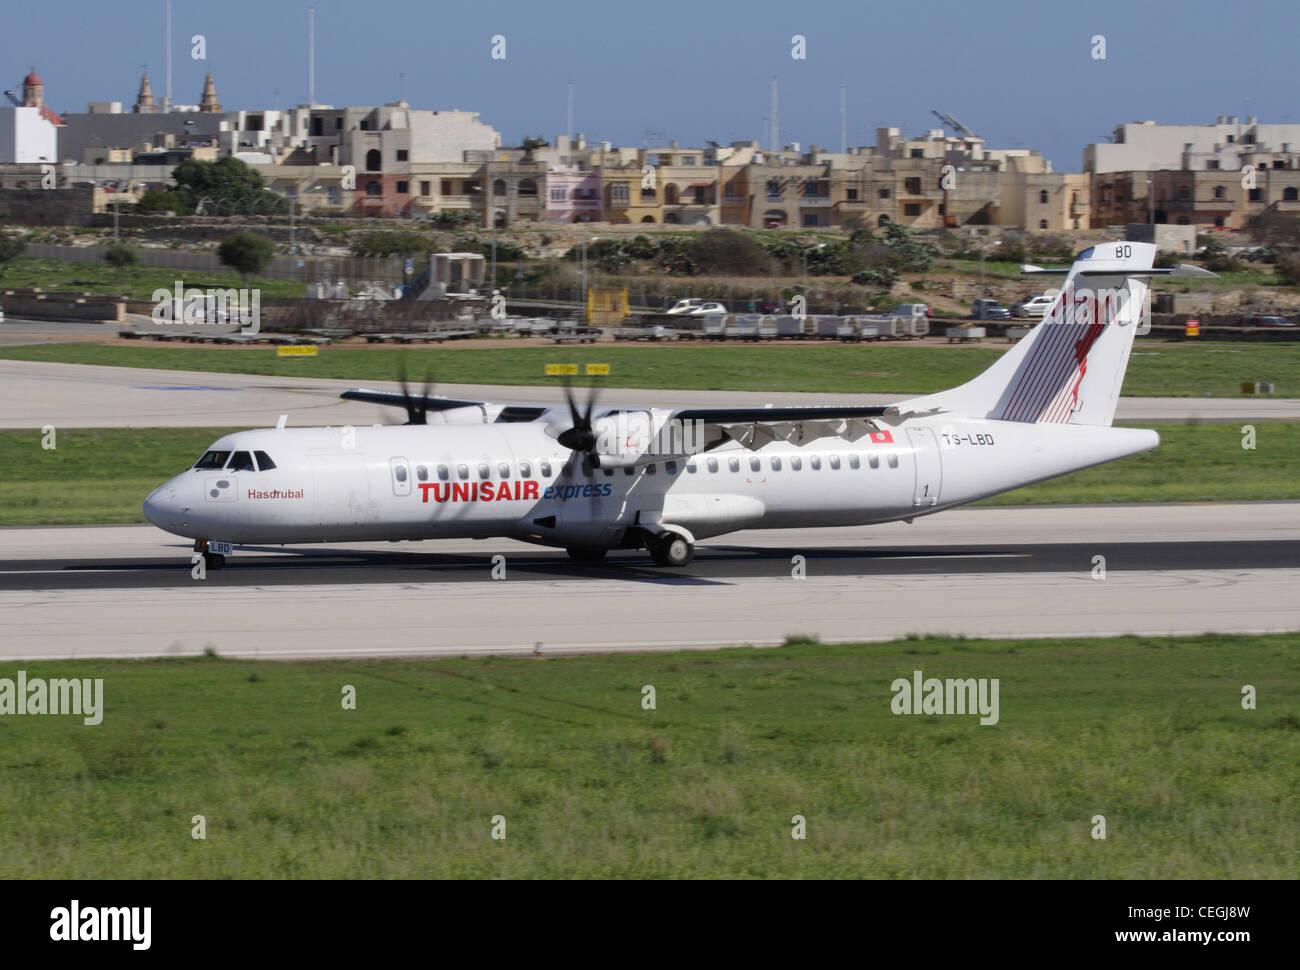 Short haul air travel. Tunisair Express ATR 72-500 turboprop regional airliner Stock Photo